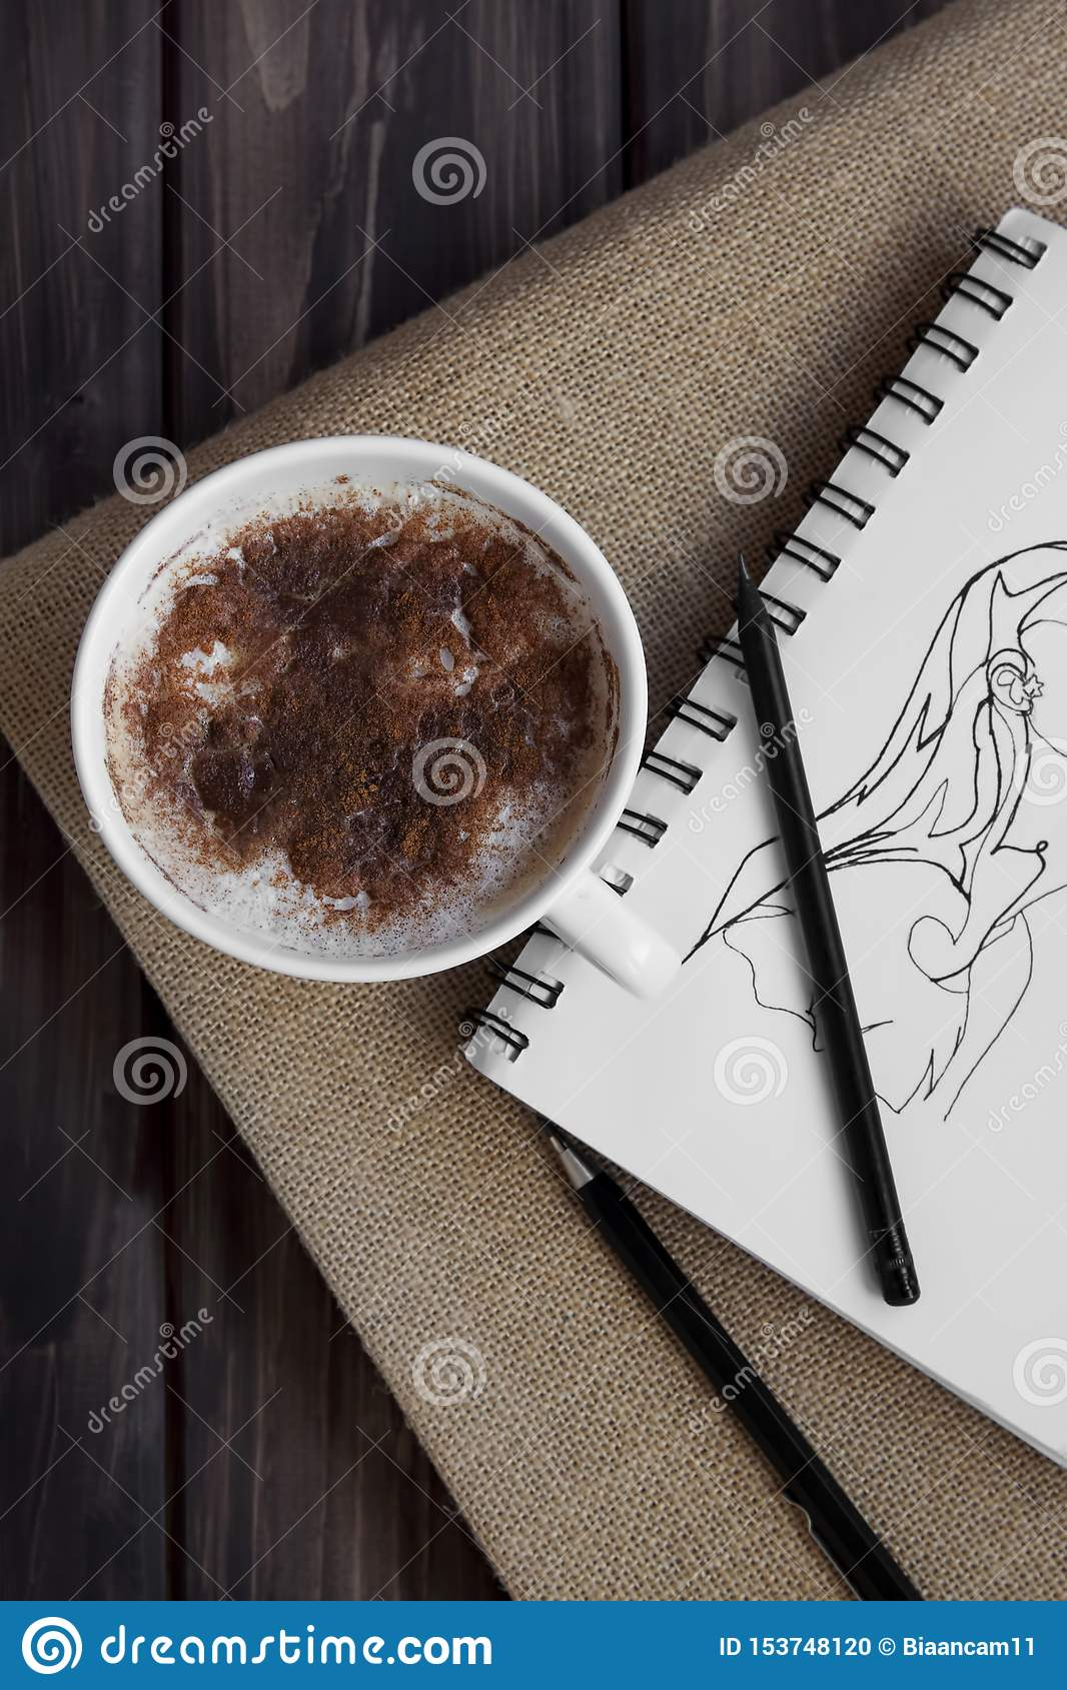 Cinnamon coffee and artsy drawing